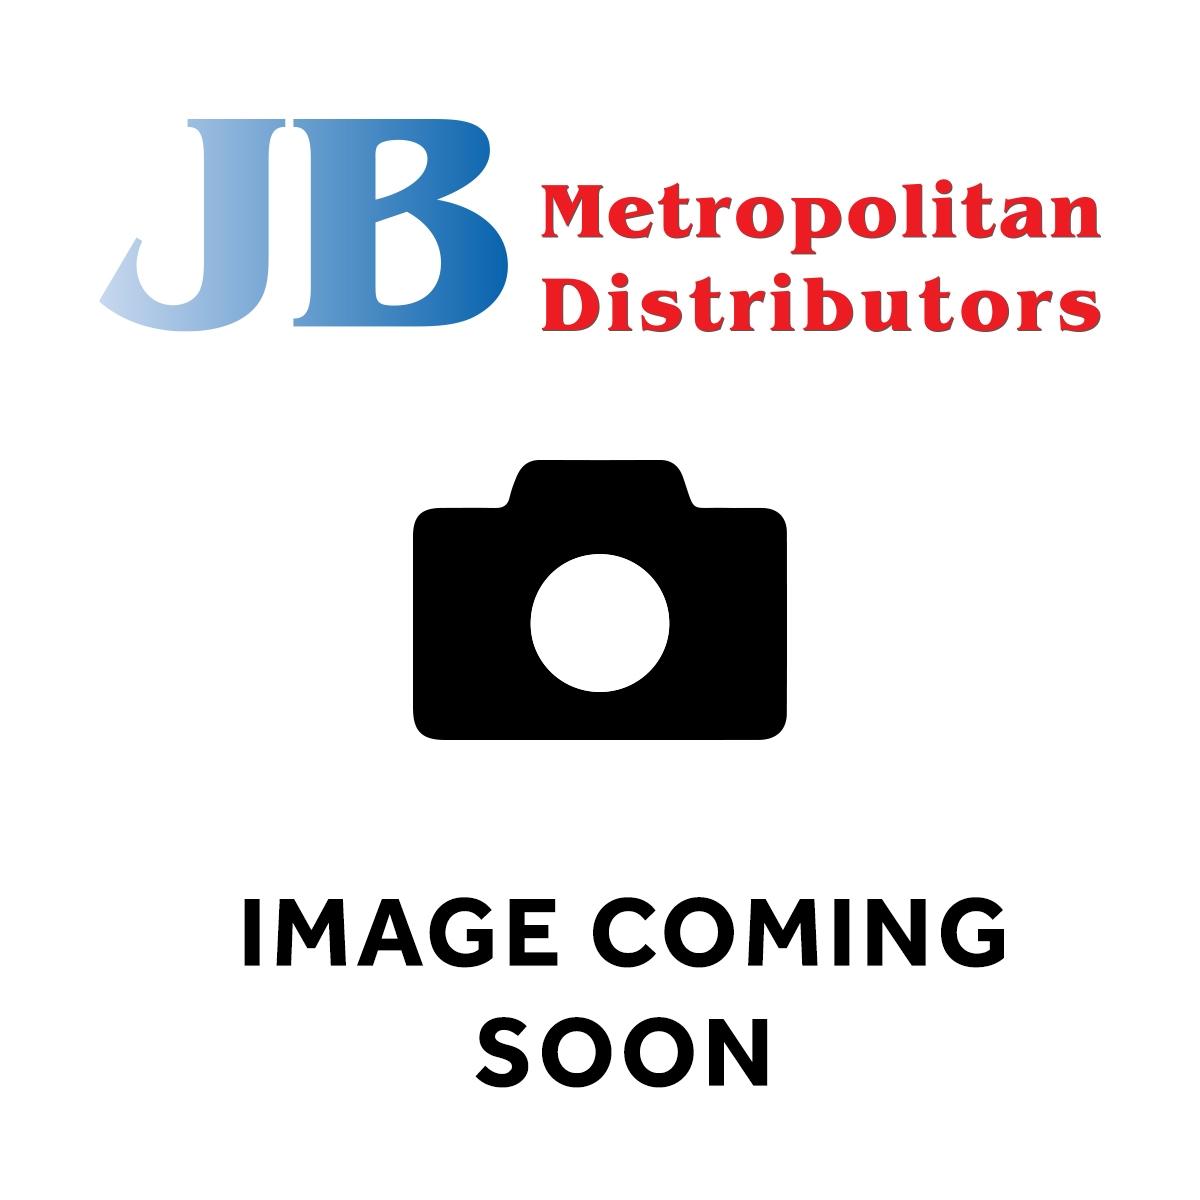 200ML JUST JUICE ORANGE MANGO